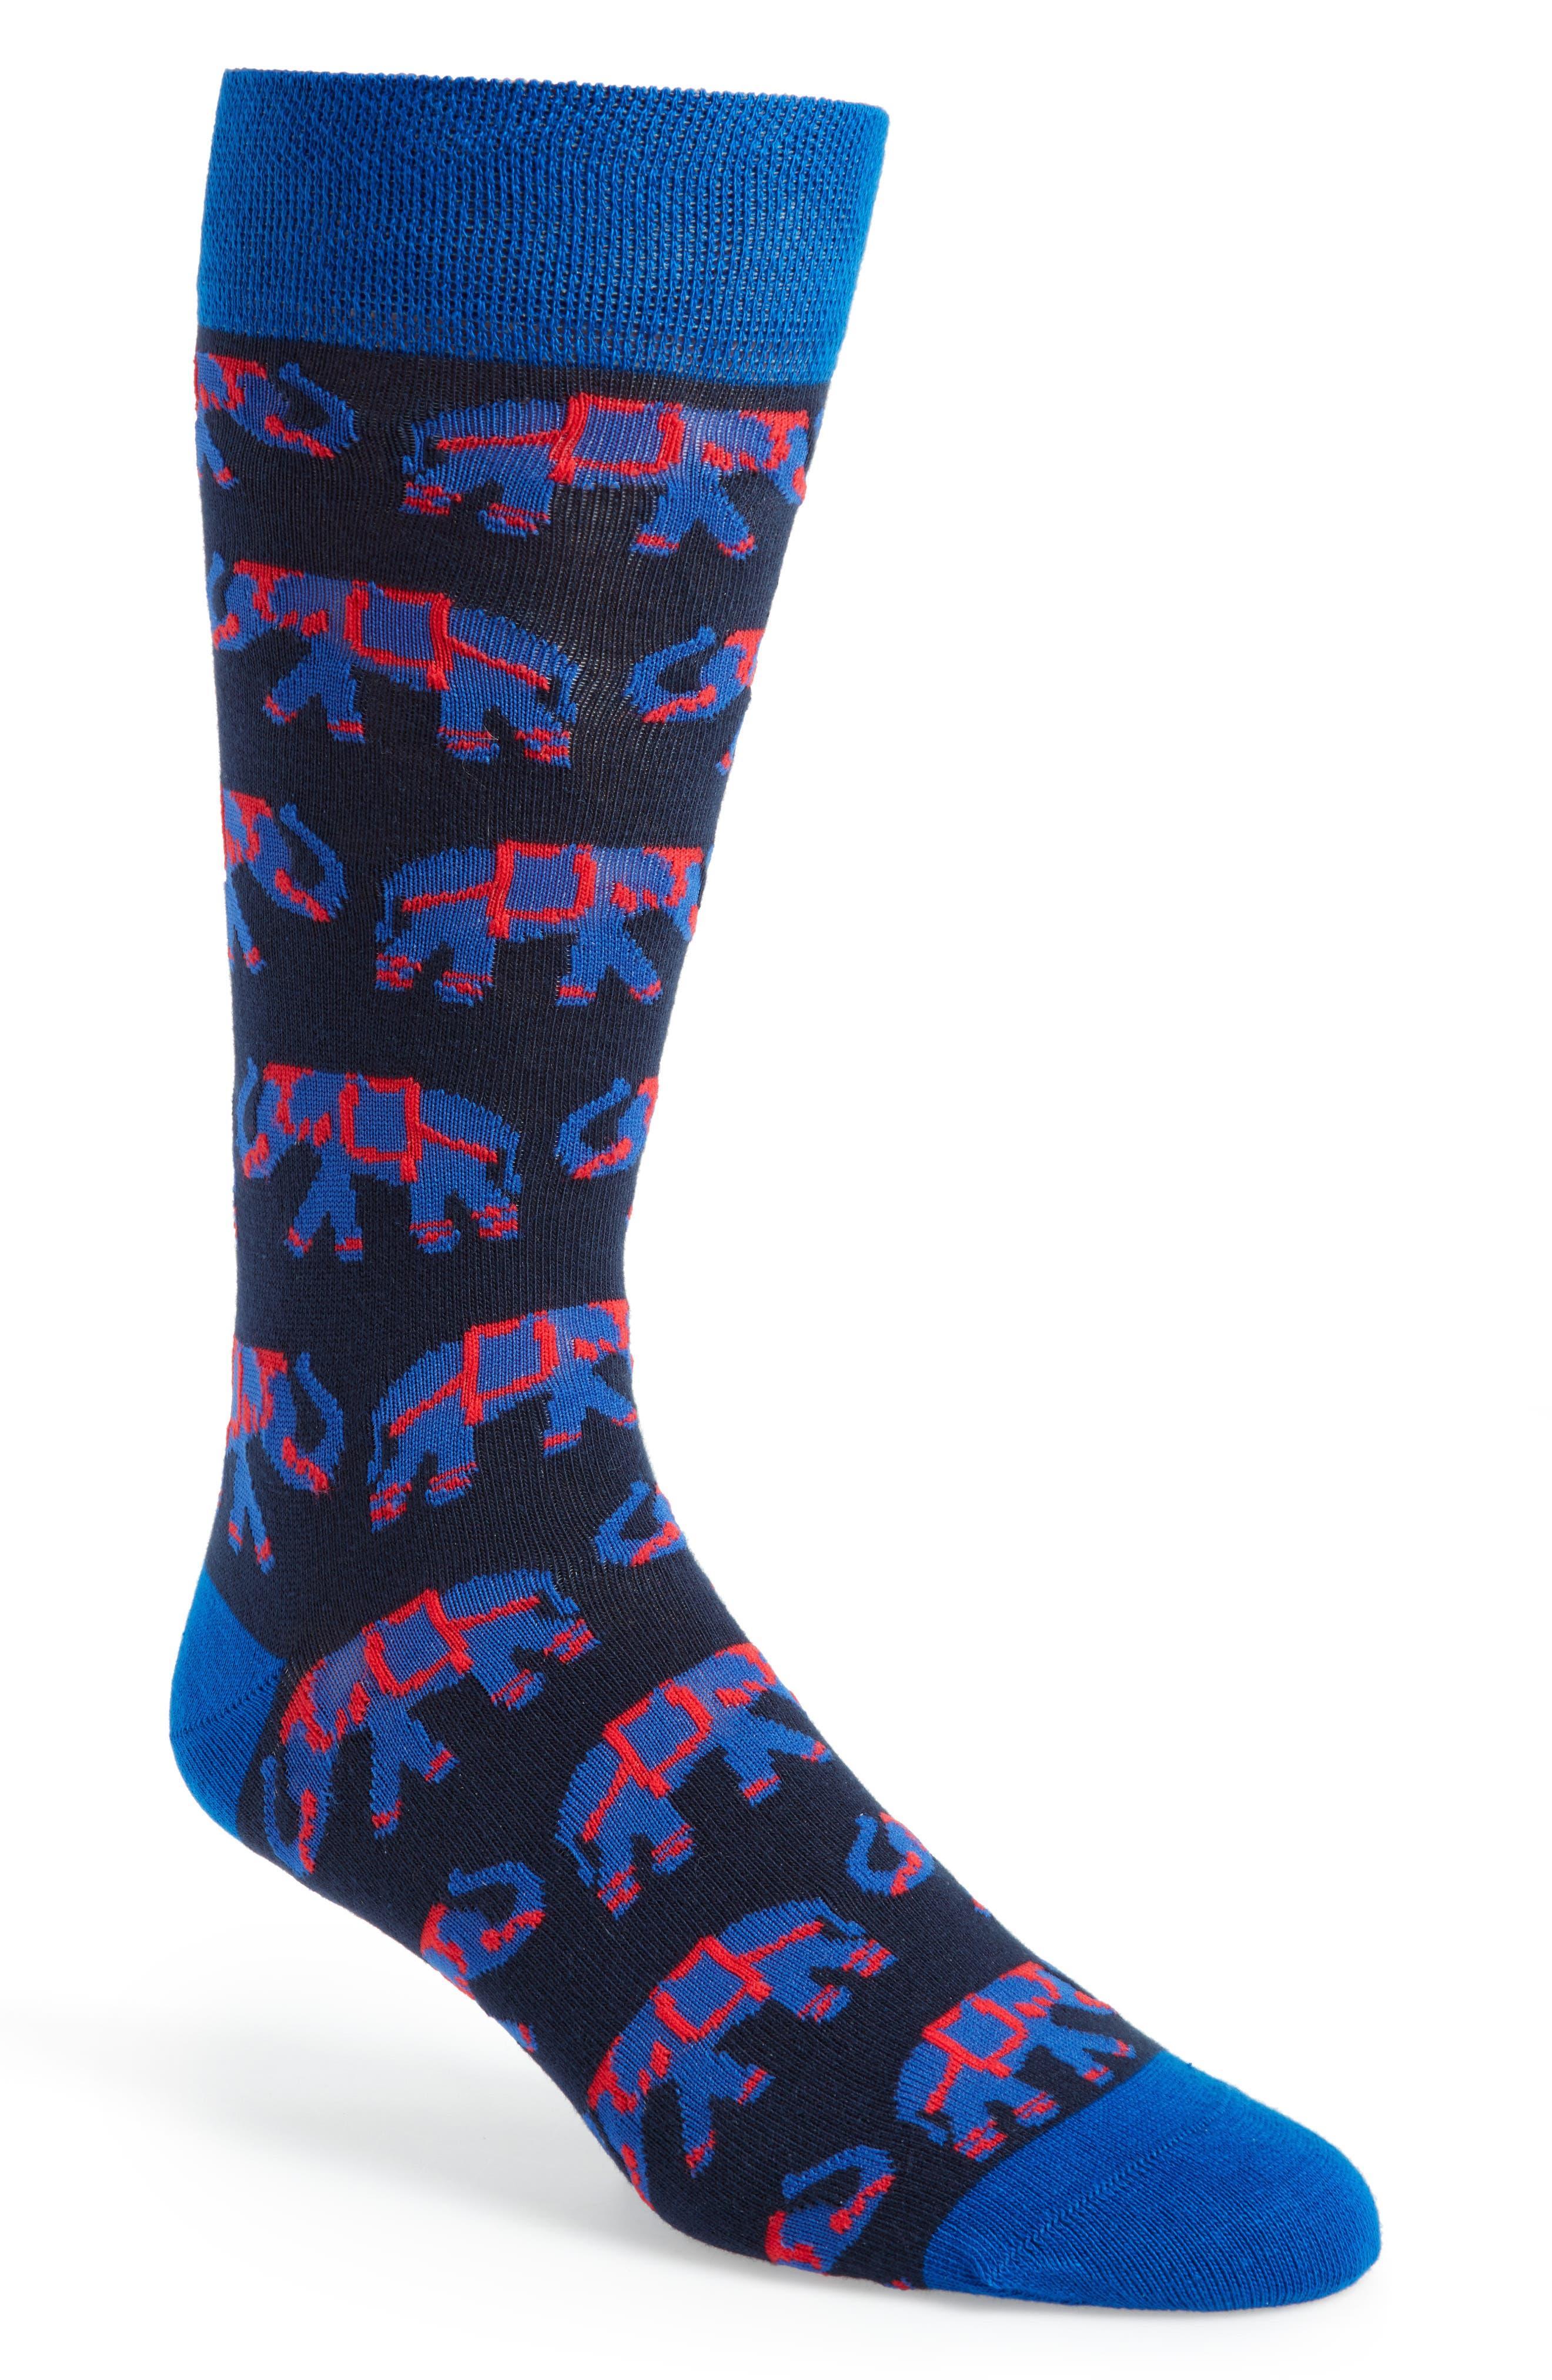 Elephant Socks,                         Main,                         color, Navy